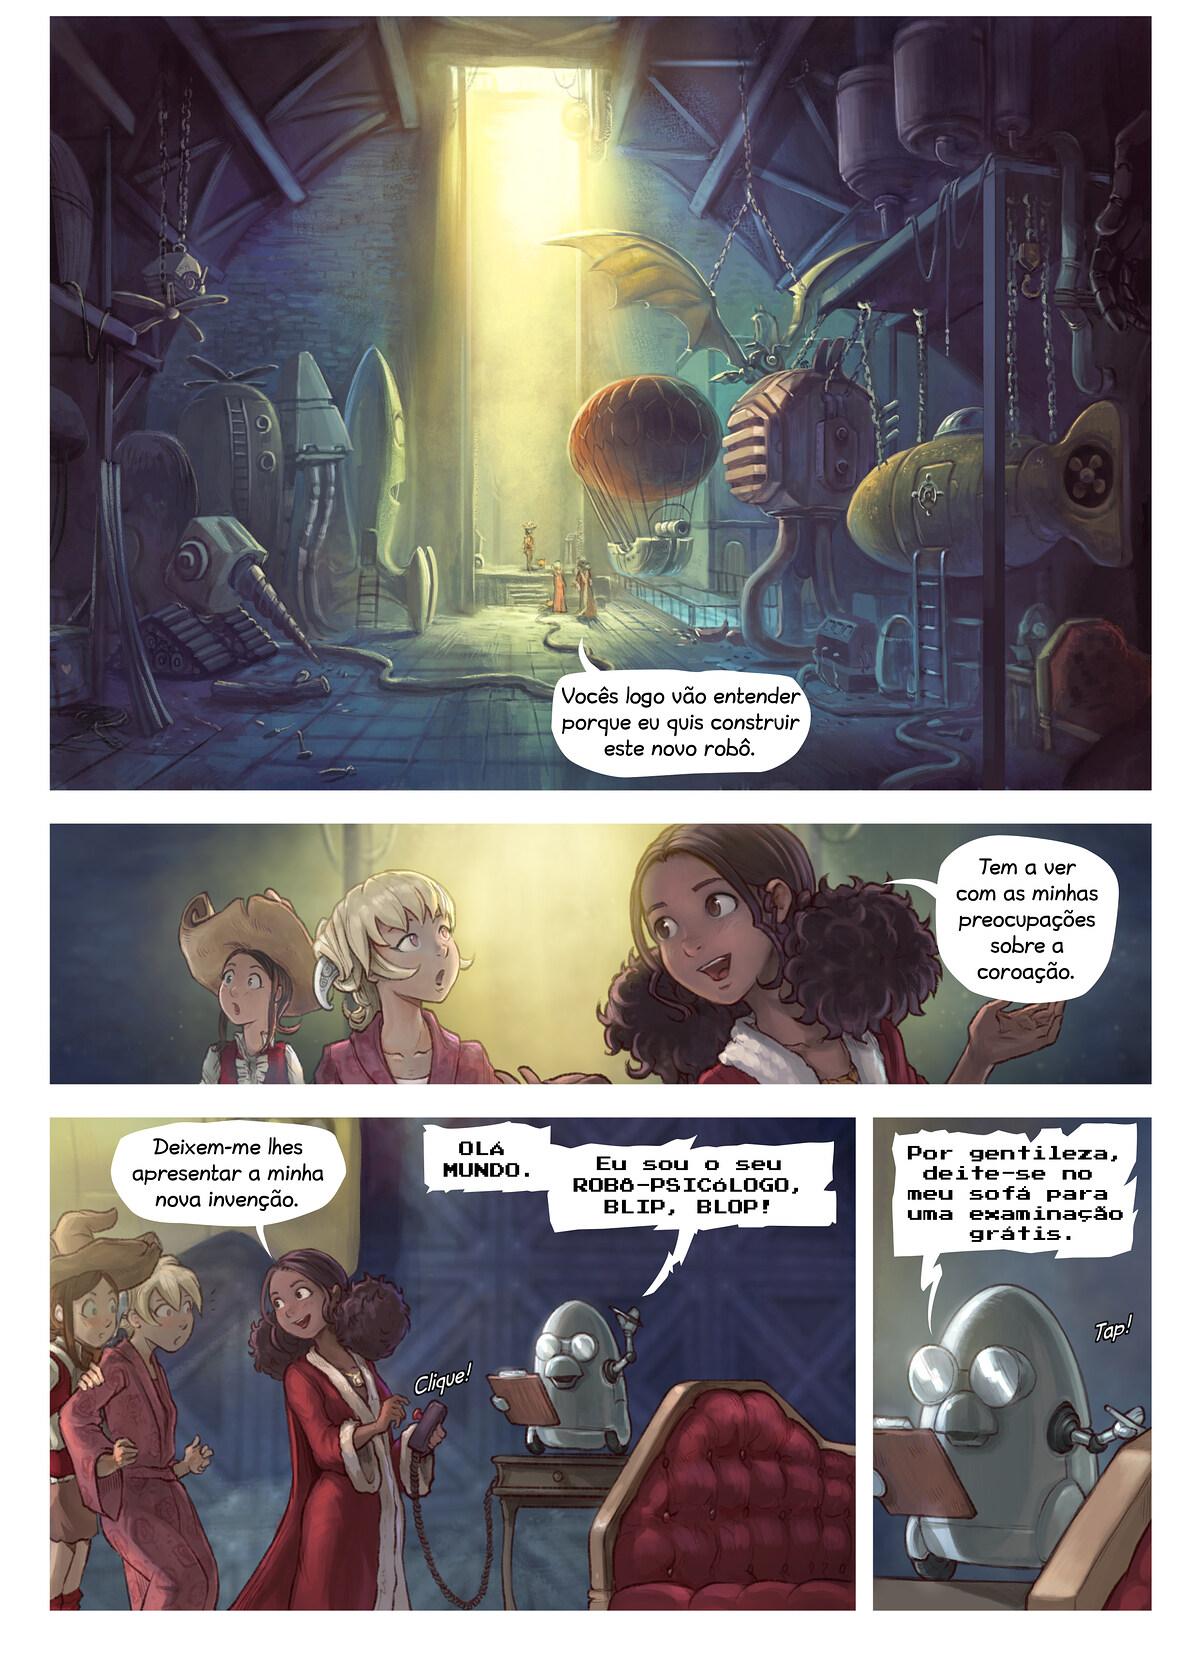 A webcomic page of Pepper&Carrot, episódio 27 [pt], página 3